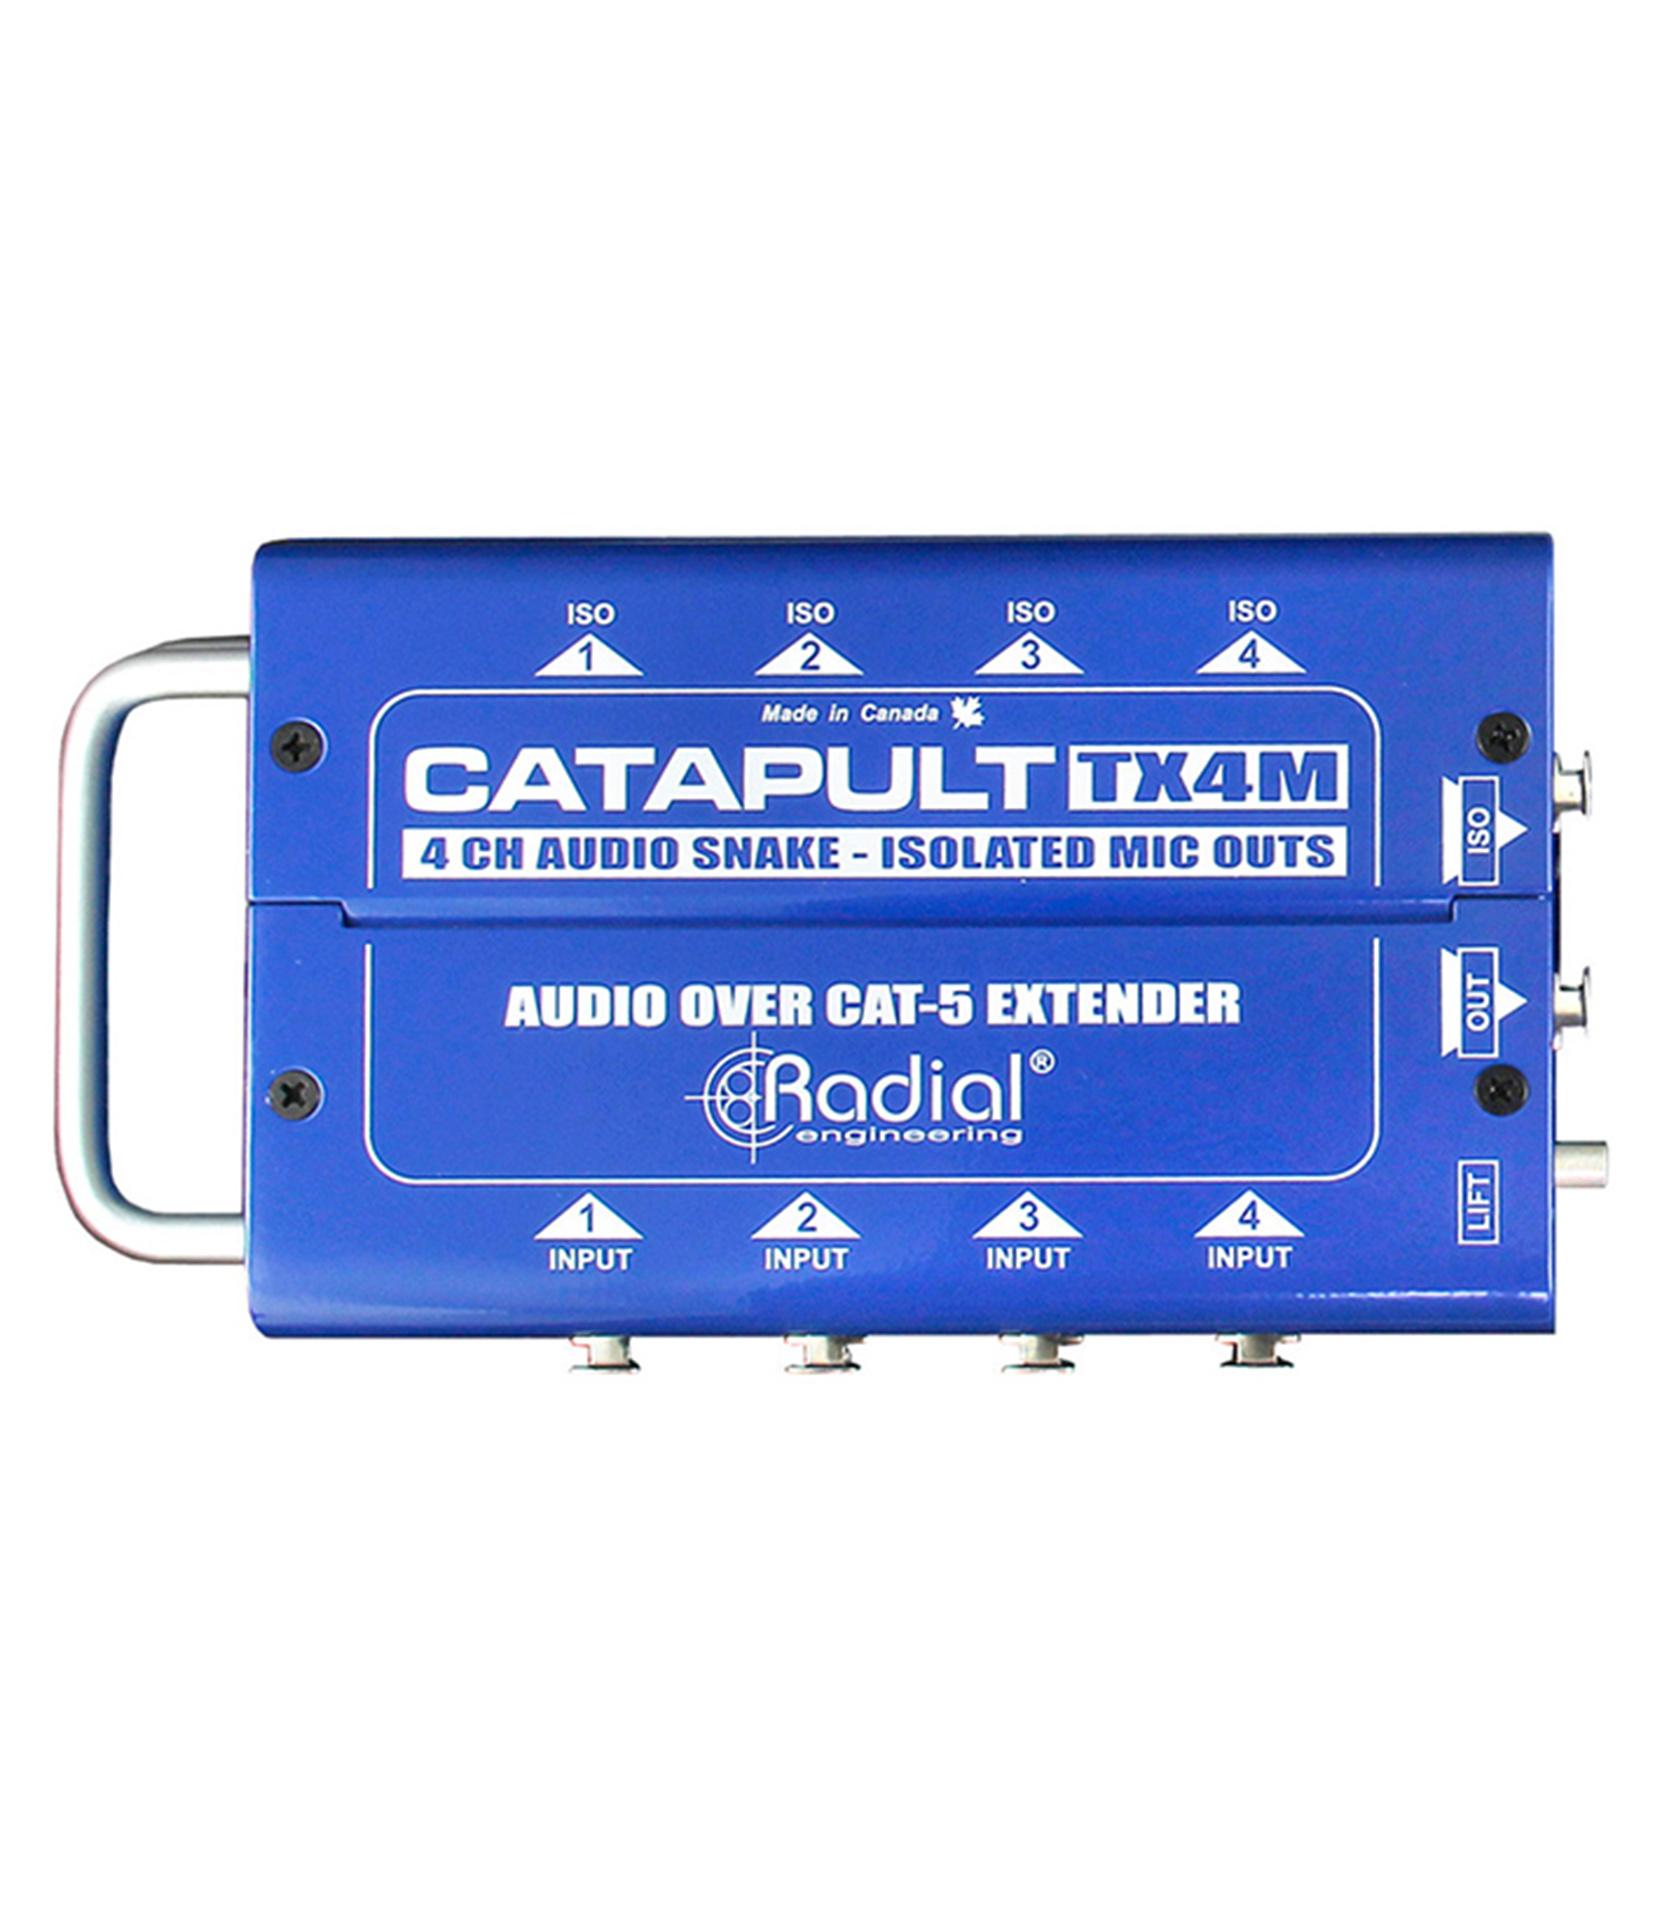 Catapult TX4L